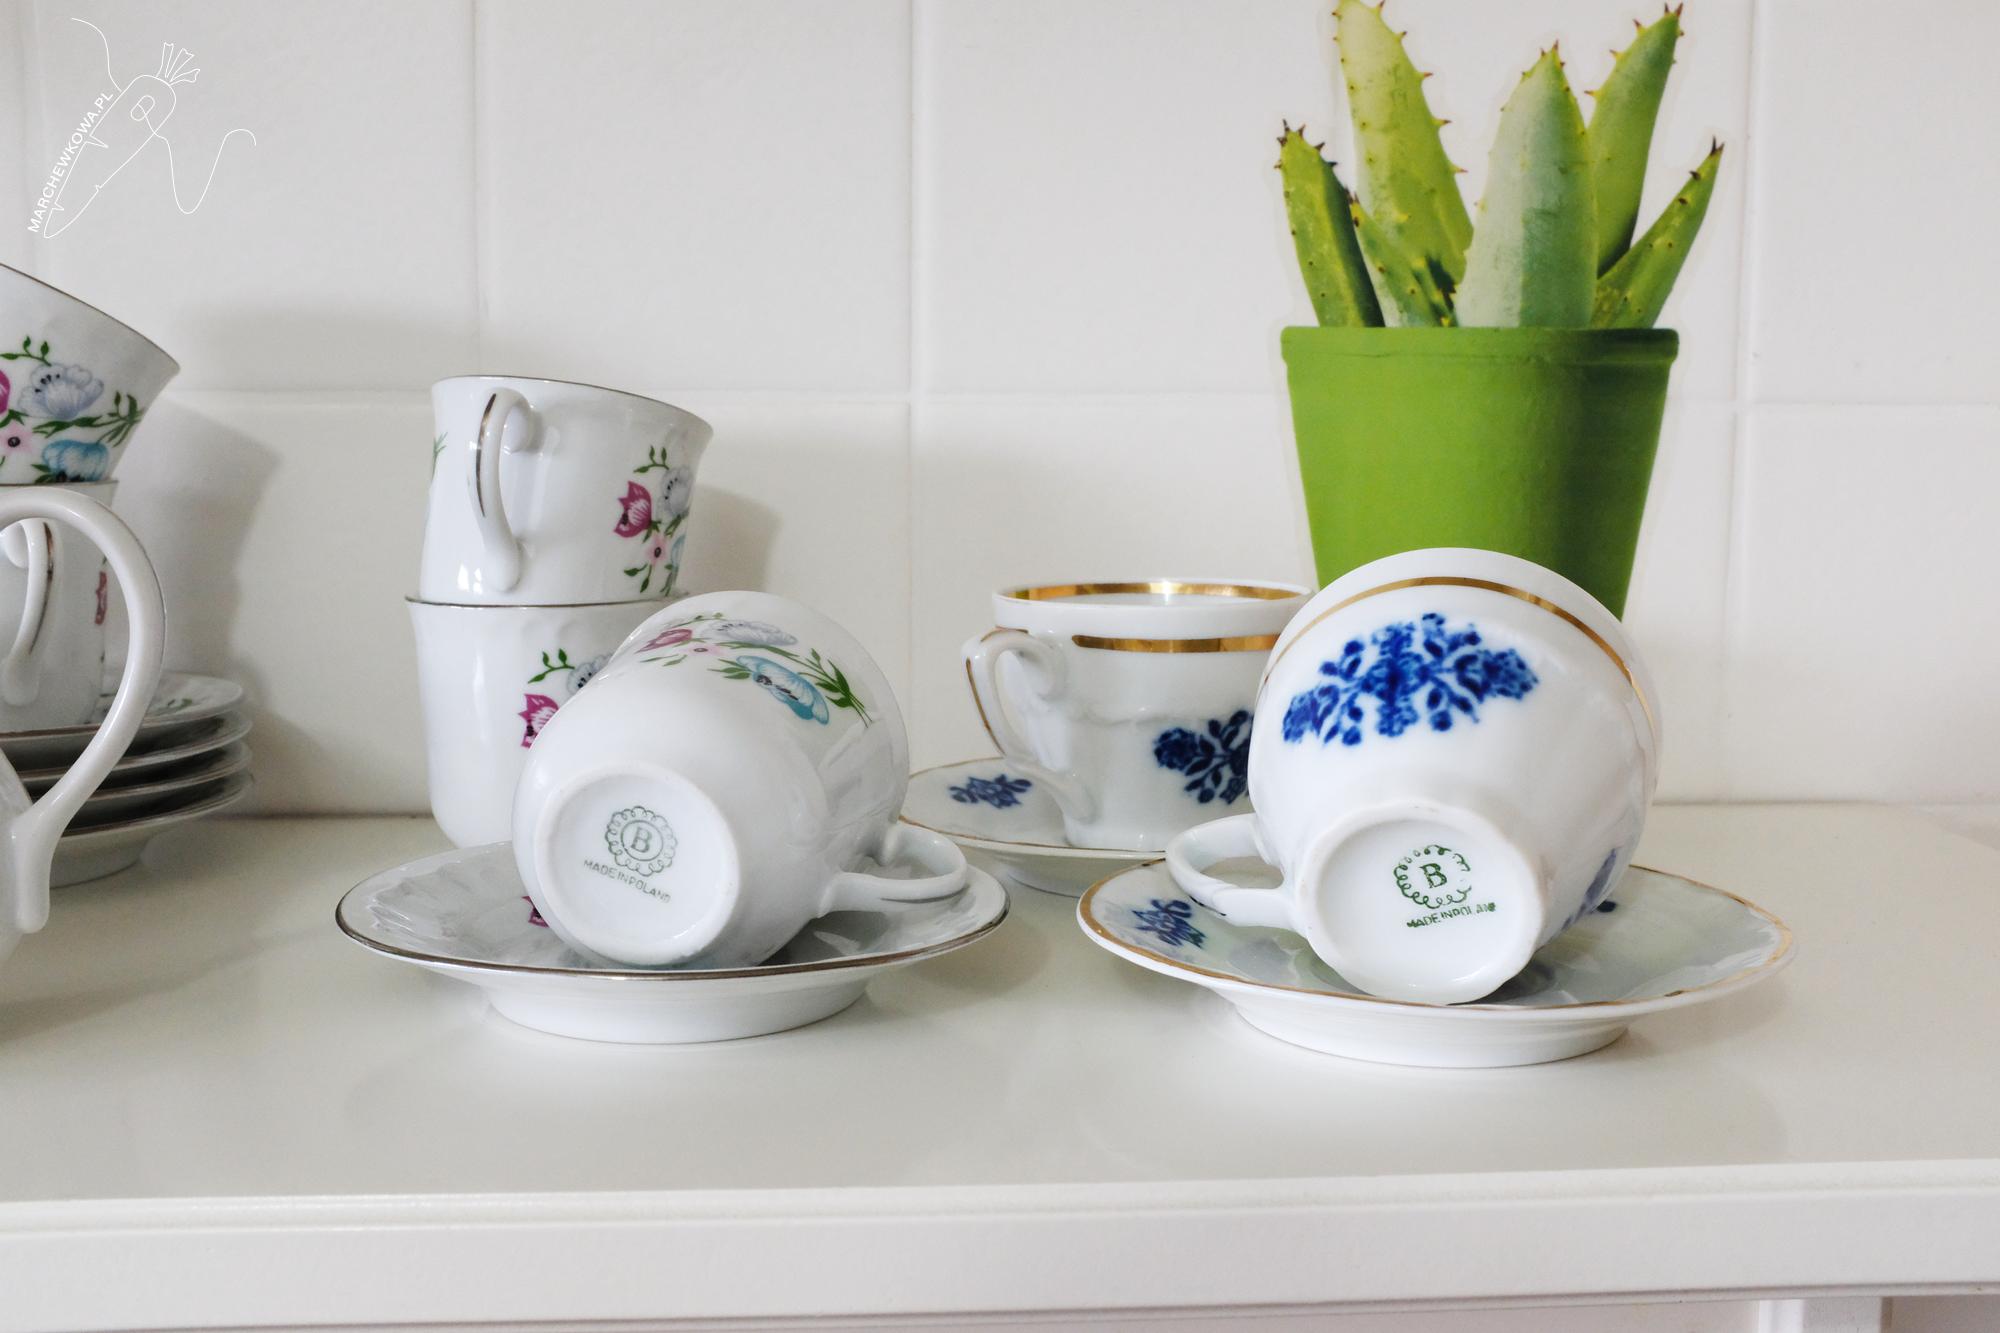 marchewkowa, blog, stara porcelana, porcelain, vintage, 1950s, 1960s, retro kuchnia, Bogucice, Giesche